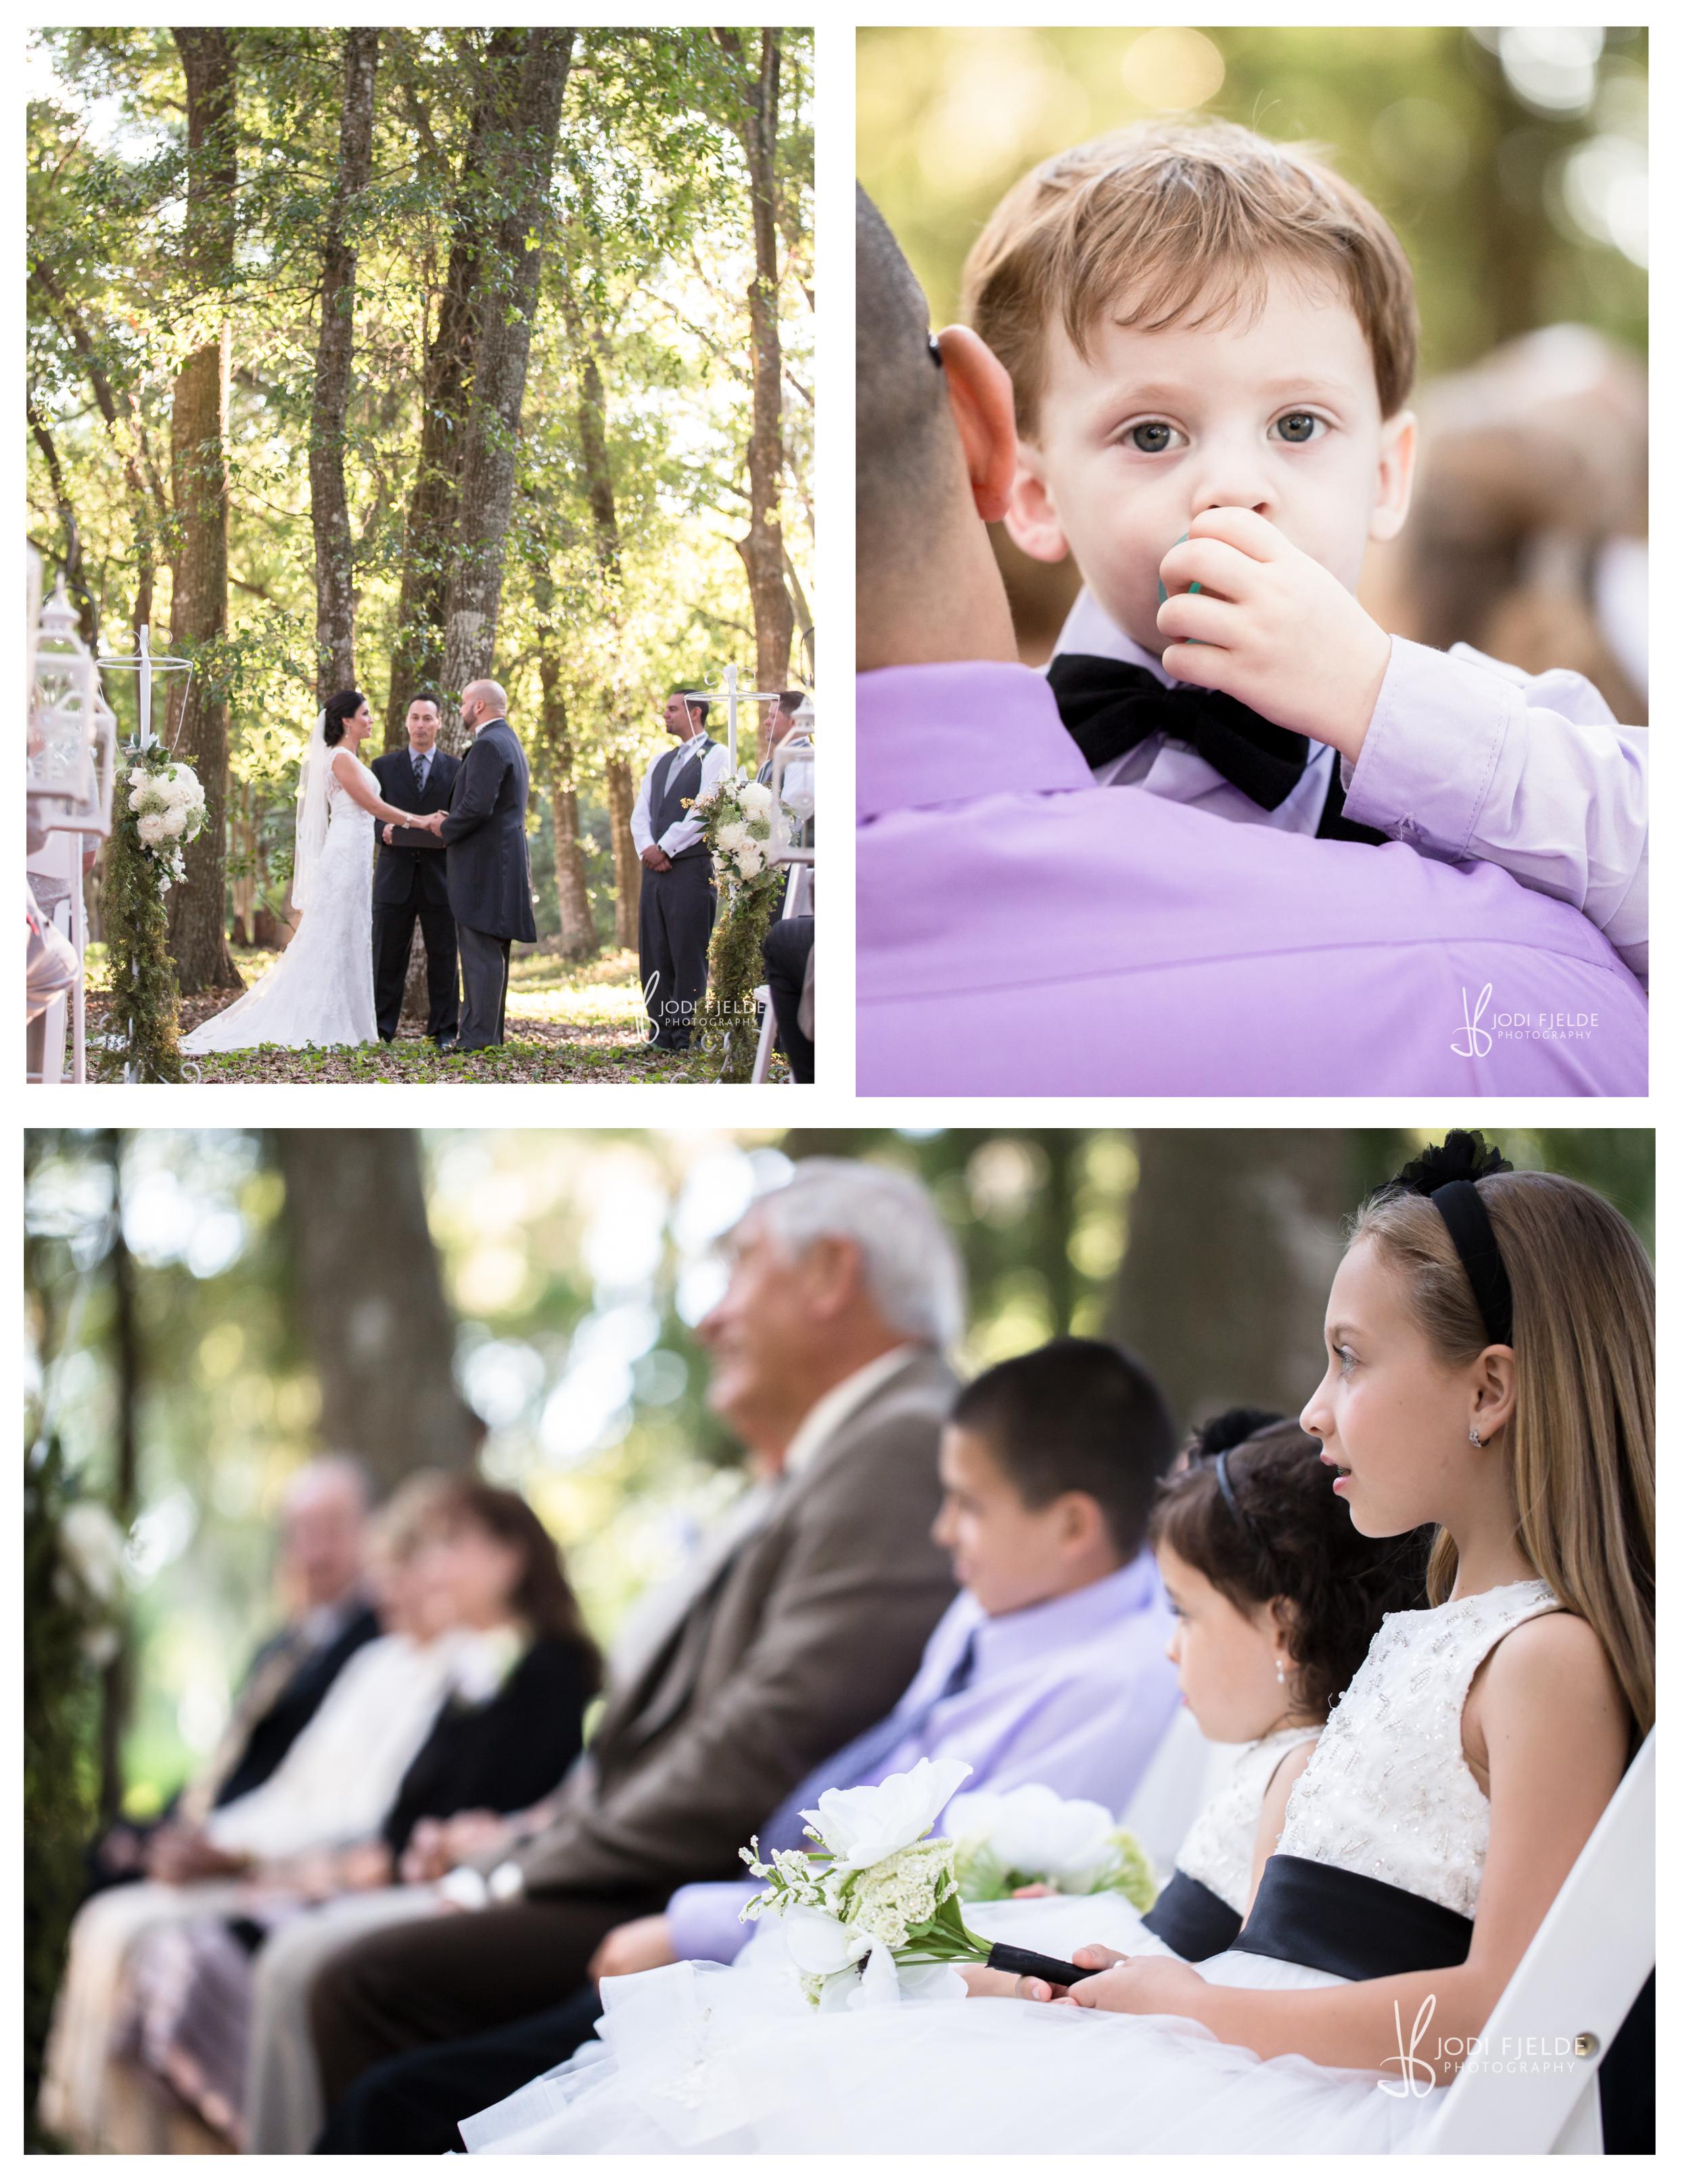 Highland_Manor_Apopka_Florida_wedding_Jackie_&_Tim_photography_jodi_Fjelde_photography-14.jpg